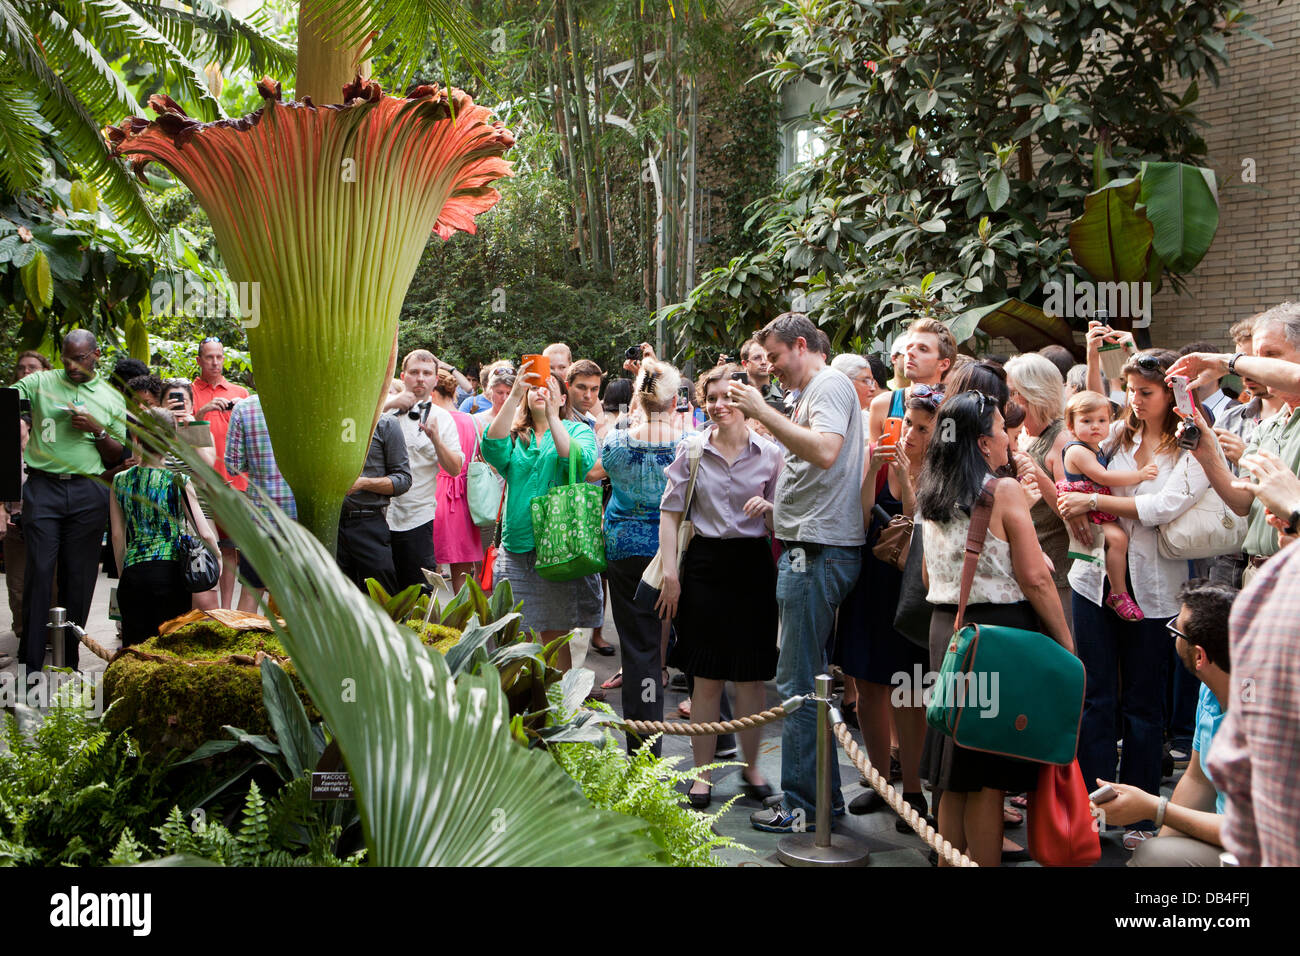 People viewing the rare Corpse flower (Titan Arum) at the US Botanic Garden in Washington, DC Stock Photo